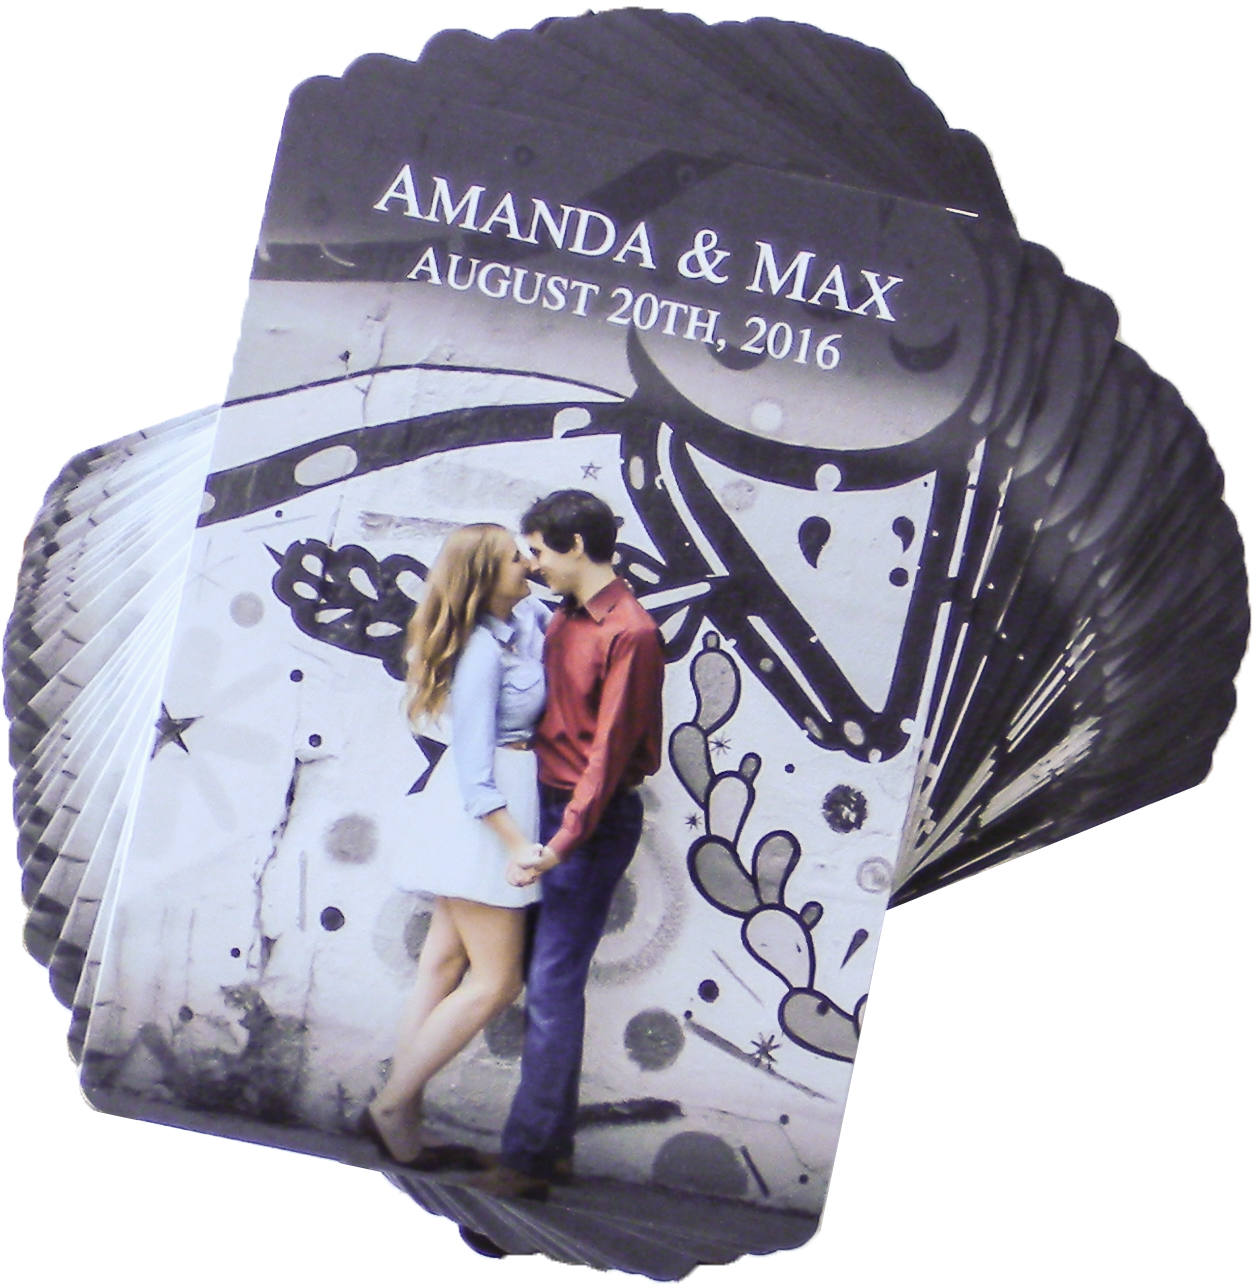 Amanda & Max Wedding Playing Cards